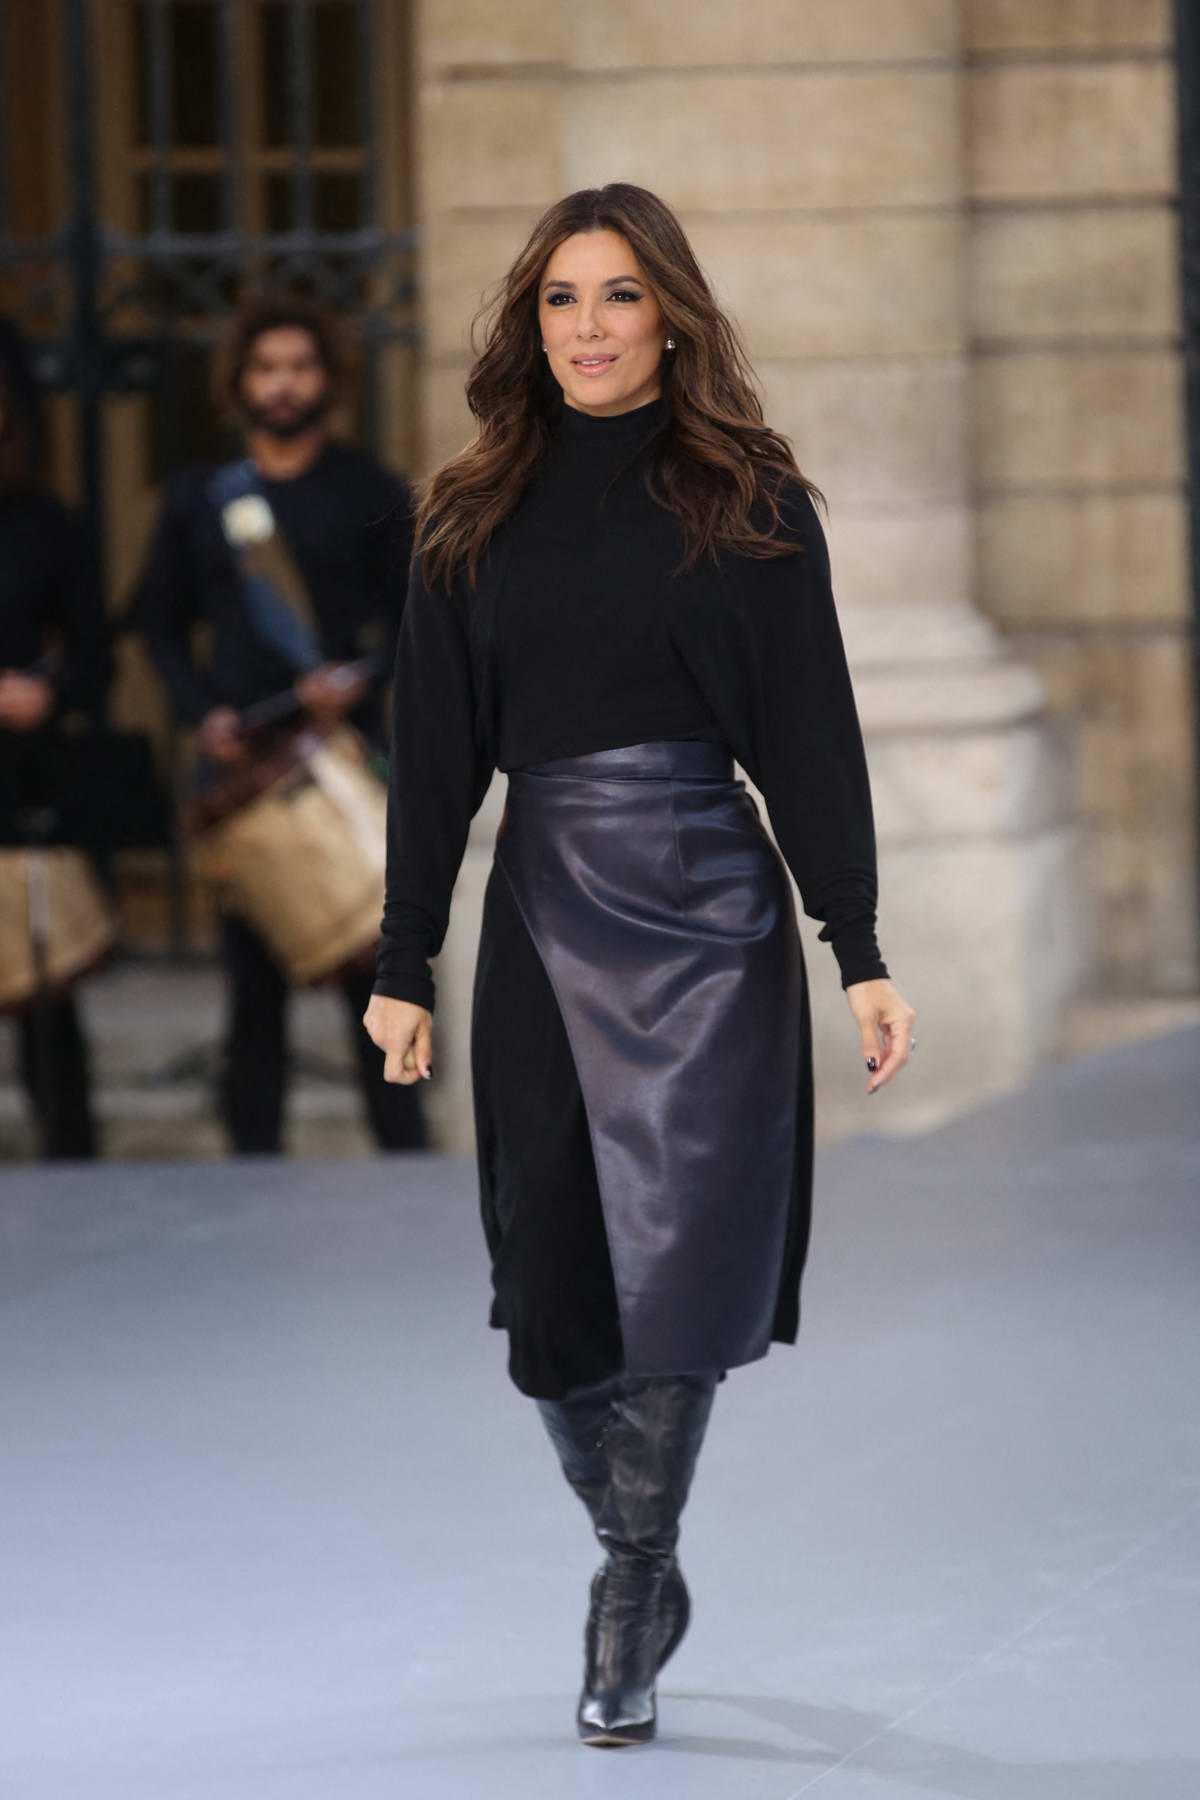 Eva Longoria walks the runway at the L'Oreal Paris Spring/Summer 2020 show during Paris Fashion Week in Paris, France